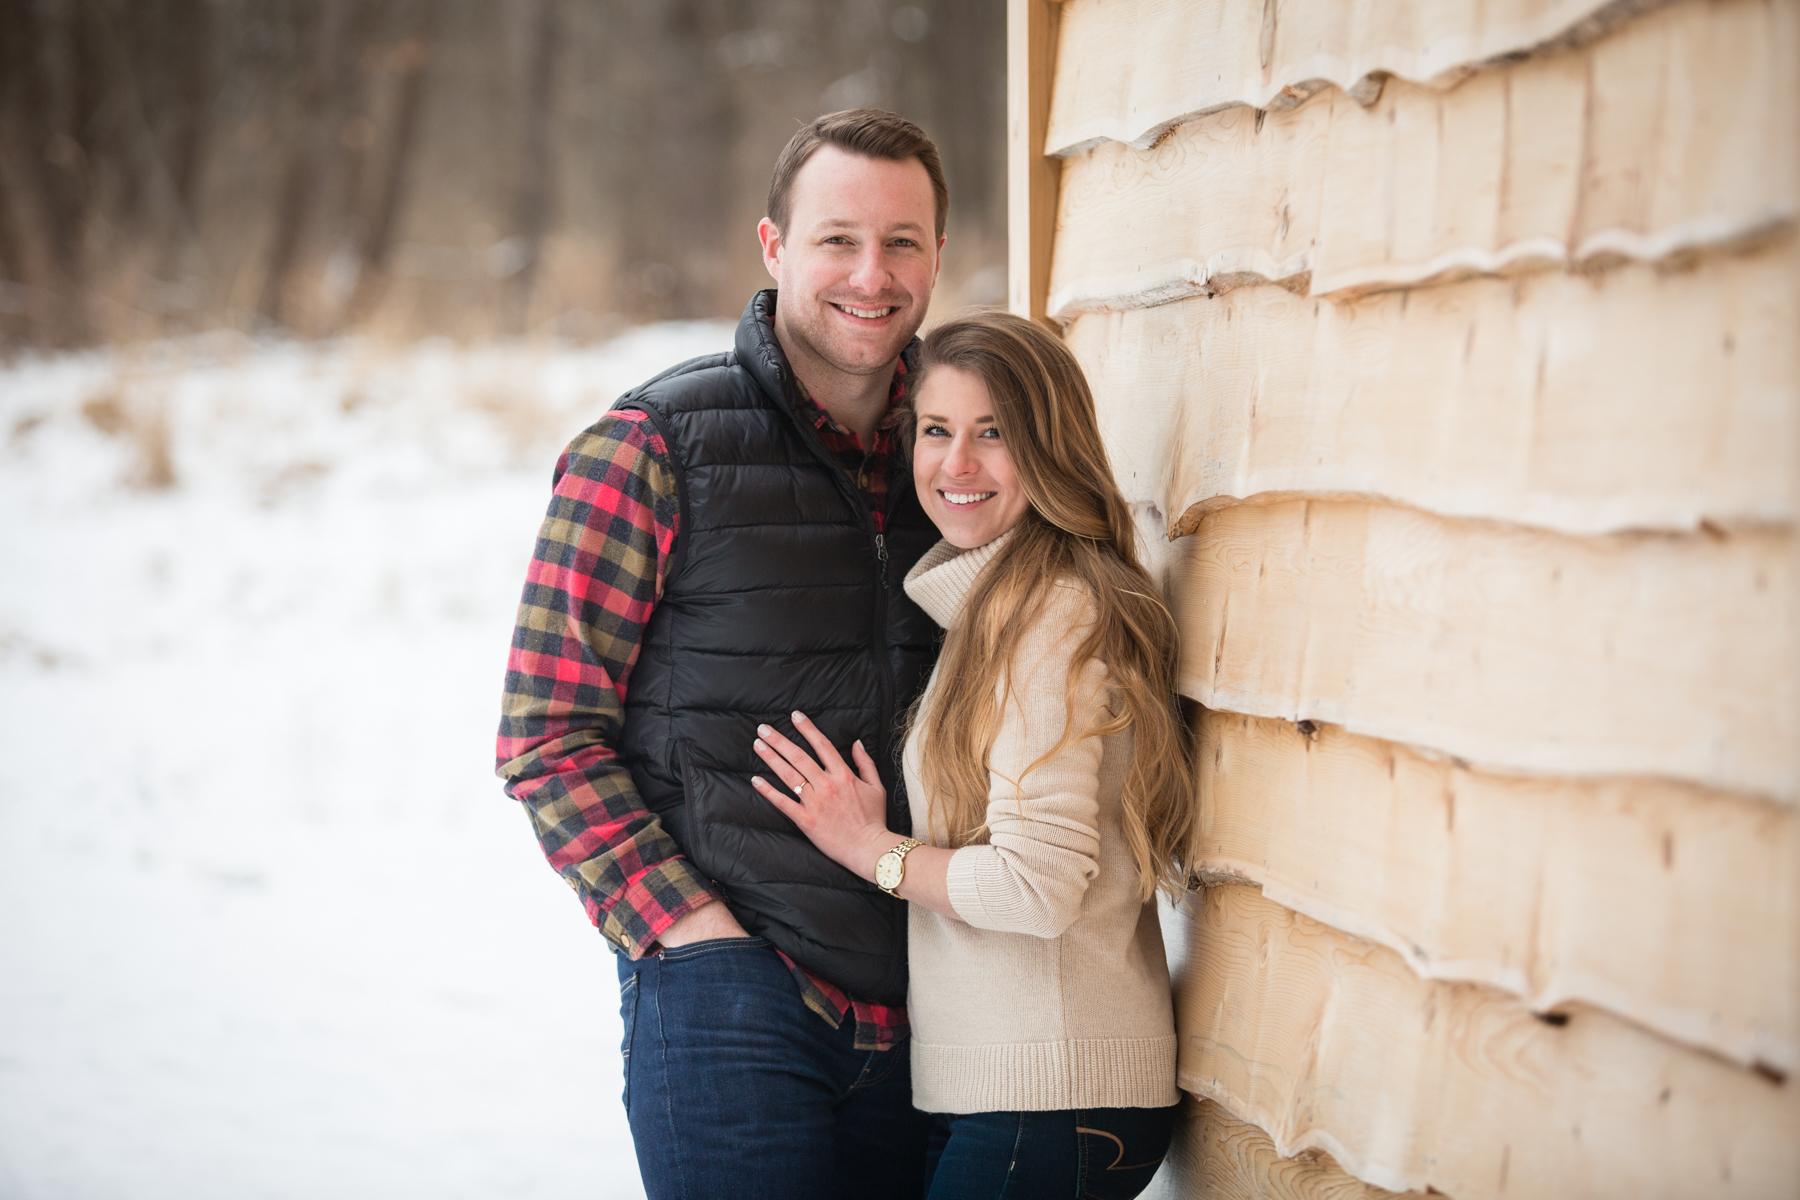 Doug&Kara_winter_Engagment_Photos_Brandon_Shafer_Photography_Blog-22.jpg